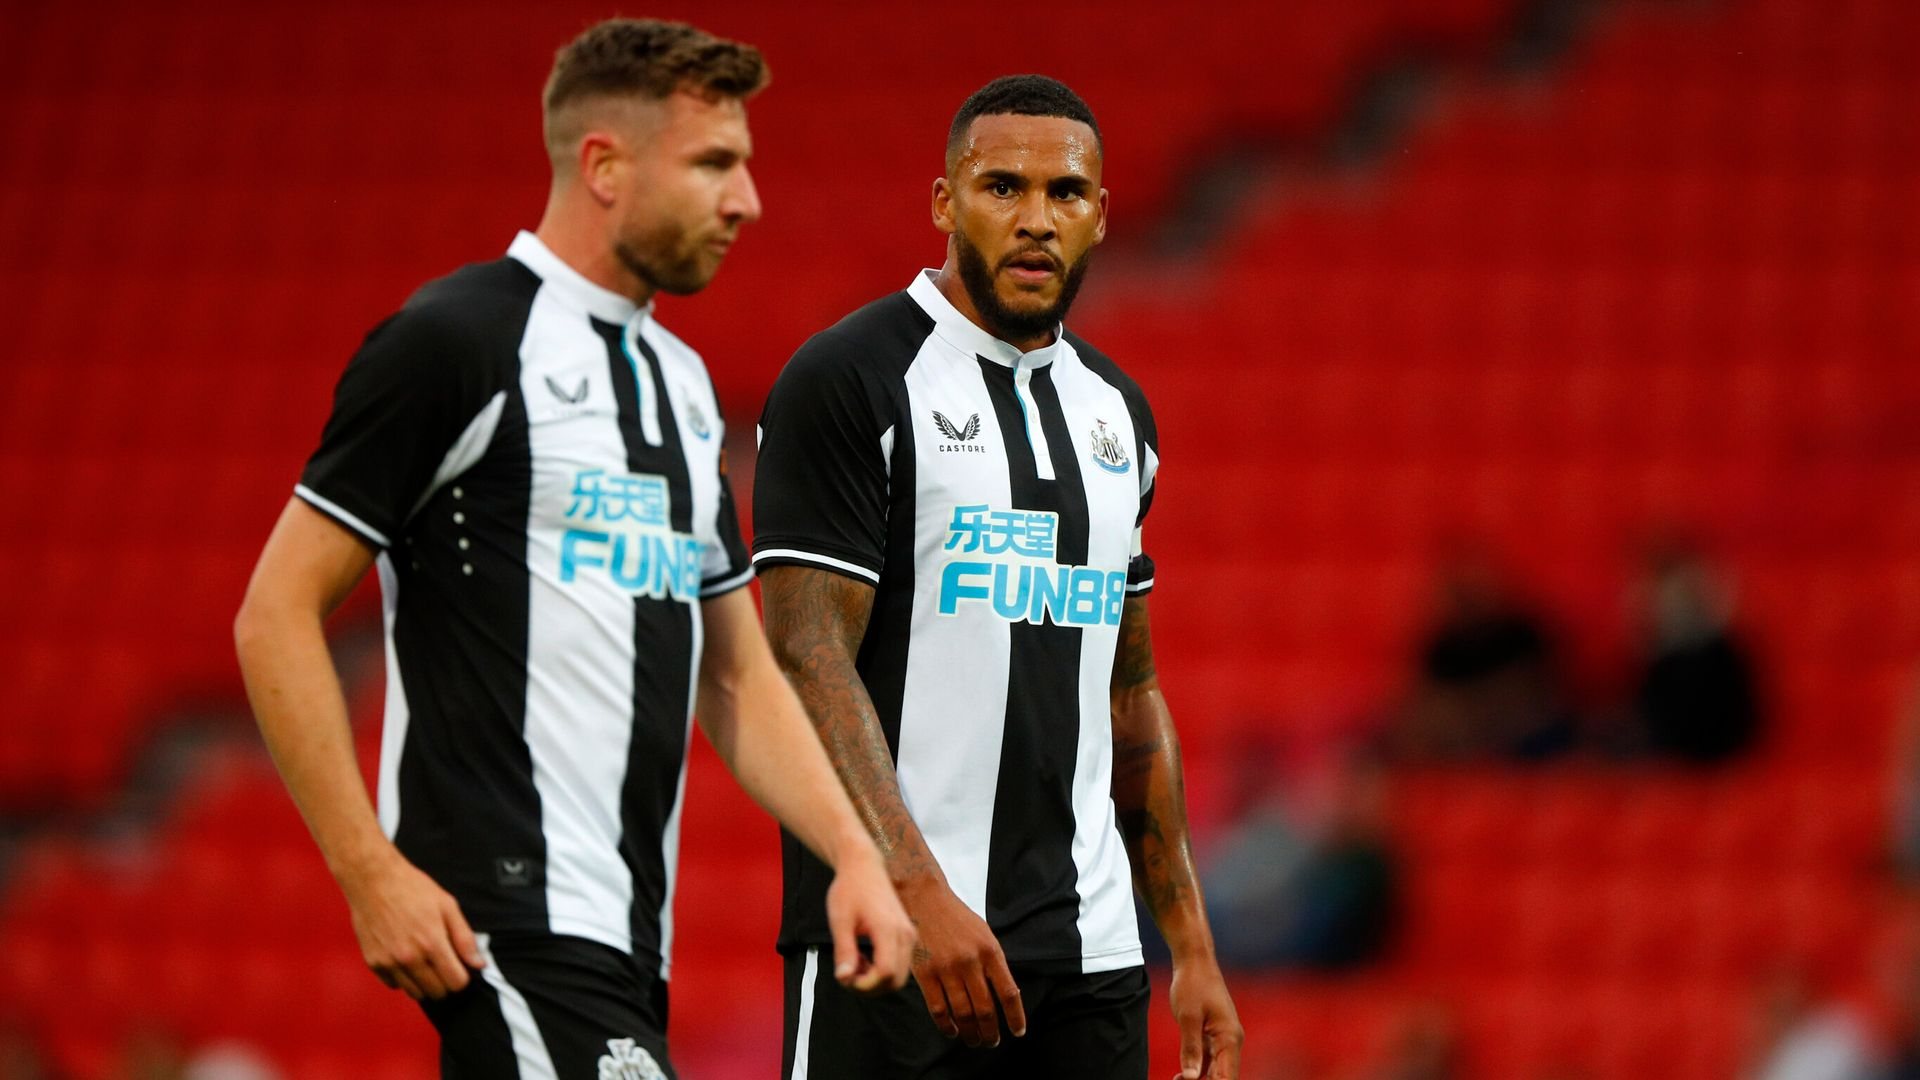 Friendlies: Newcastle booed off; Mahrez beauty for City